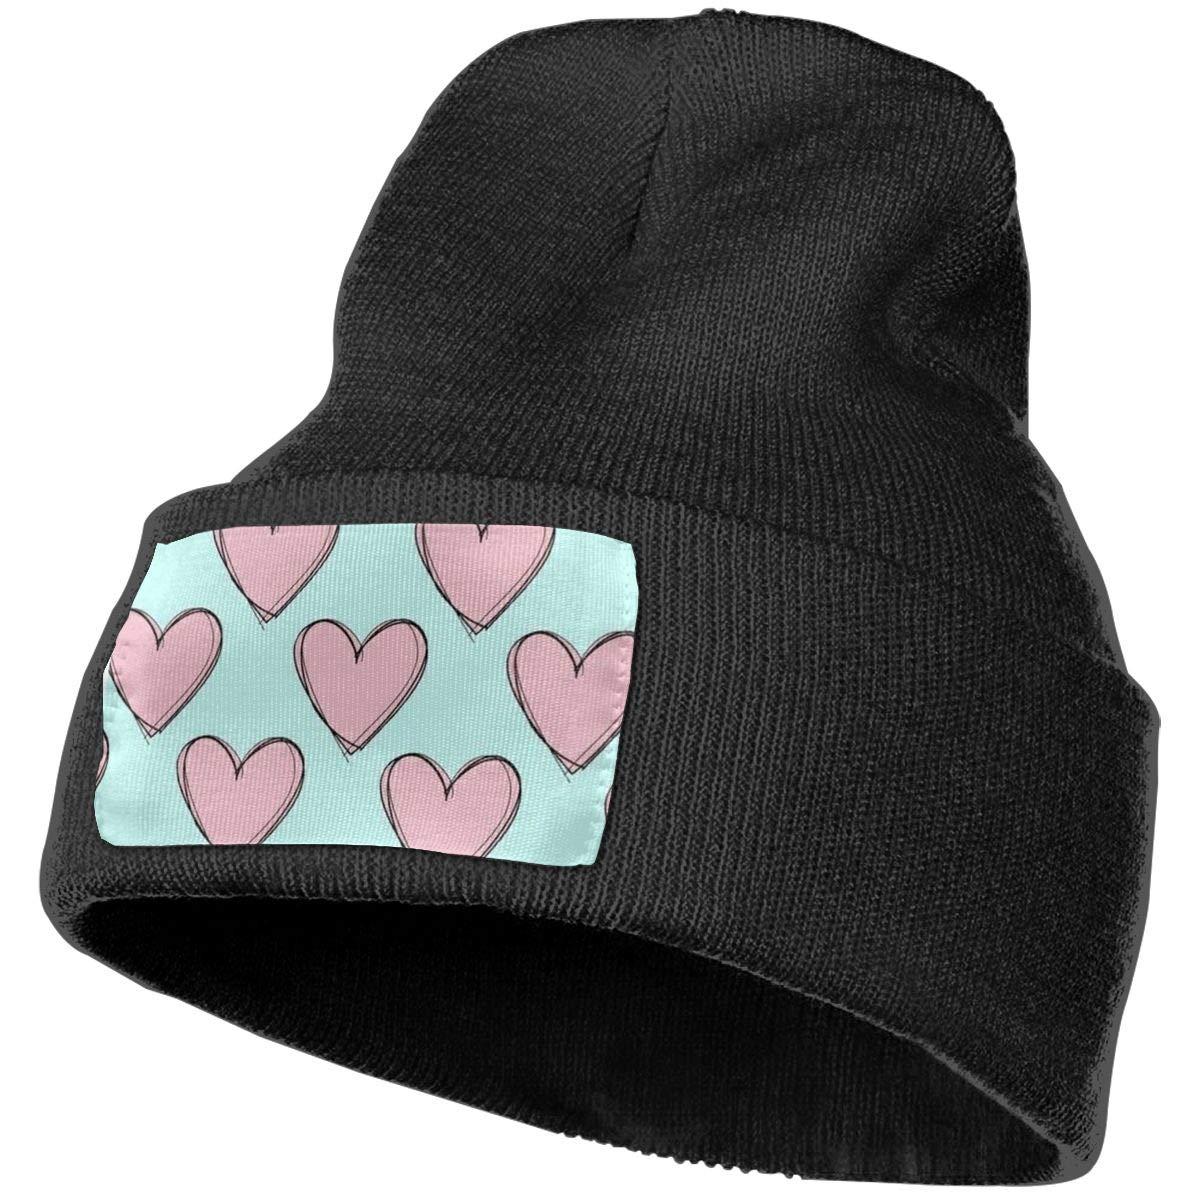 Yubb7E Hearts Warm Knit Winter Solid Beanie Hat Unisex Skull Cap